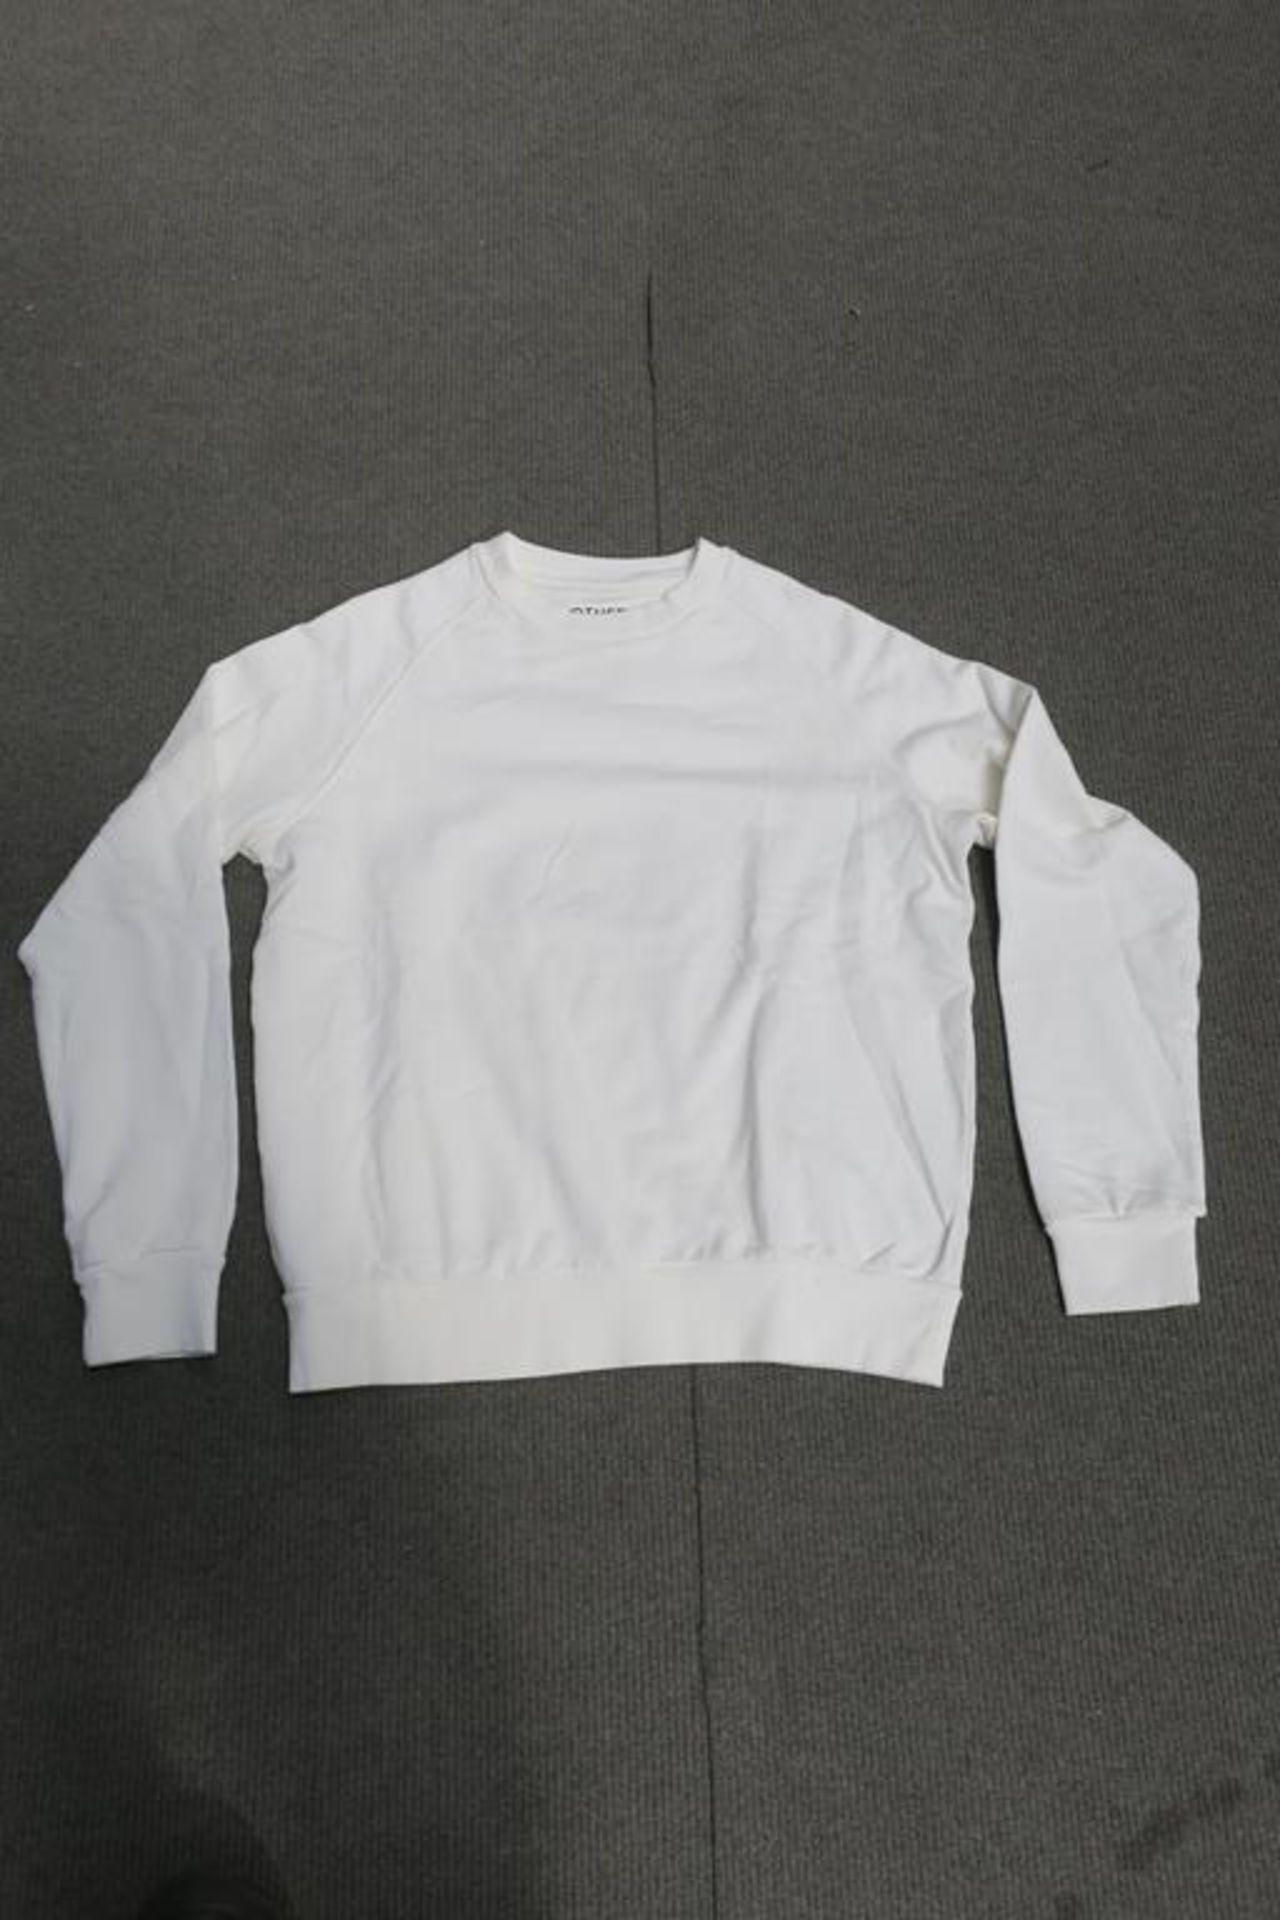 Lot 743 - 8 Other Ragian Sweatshirts Long Sleeved, Colour Ecru, 5 x Large, 1 x Medium, 3 x Small